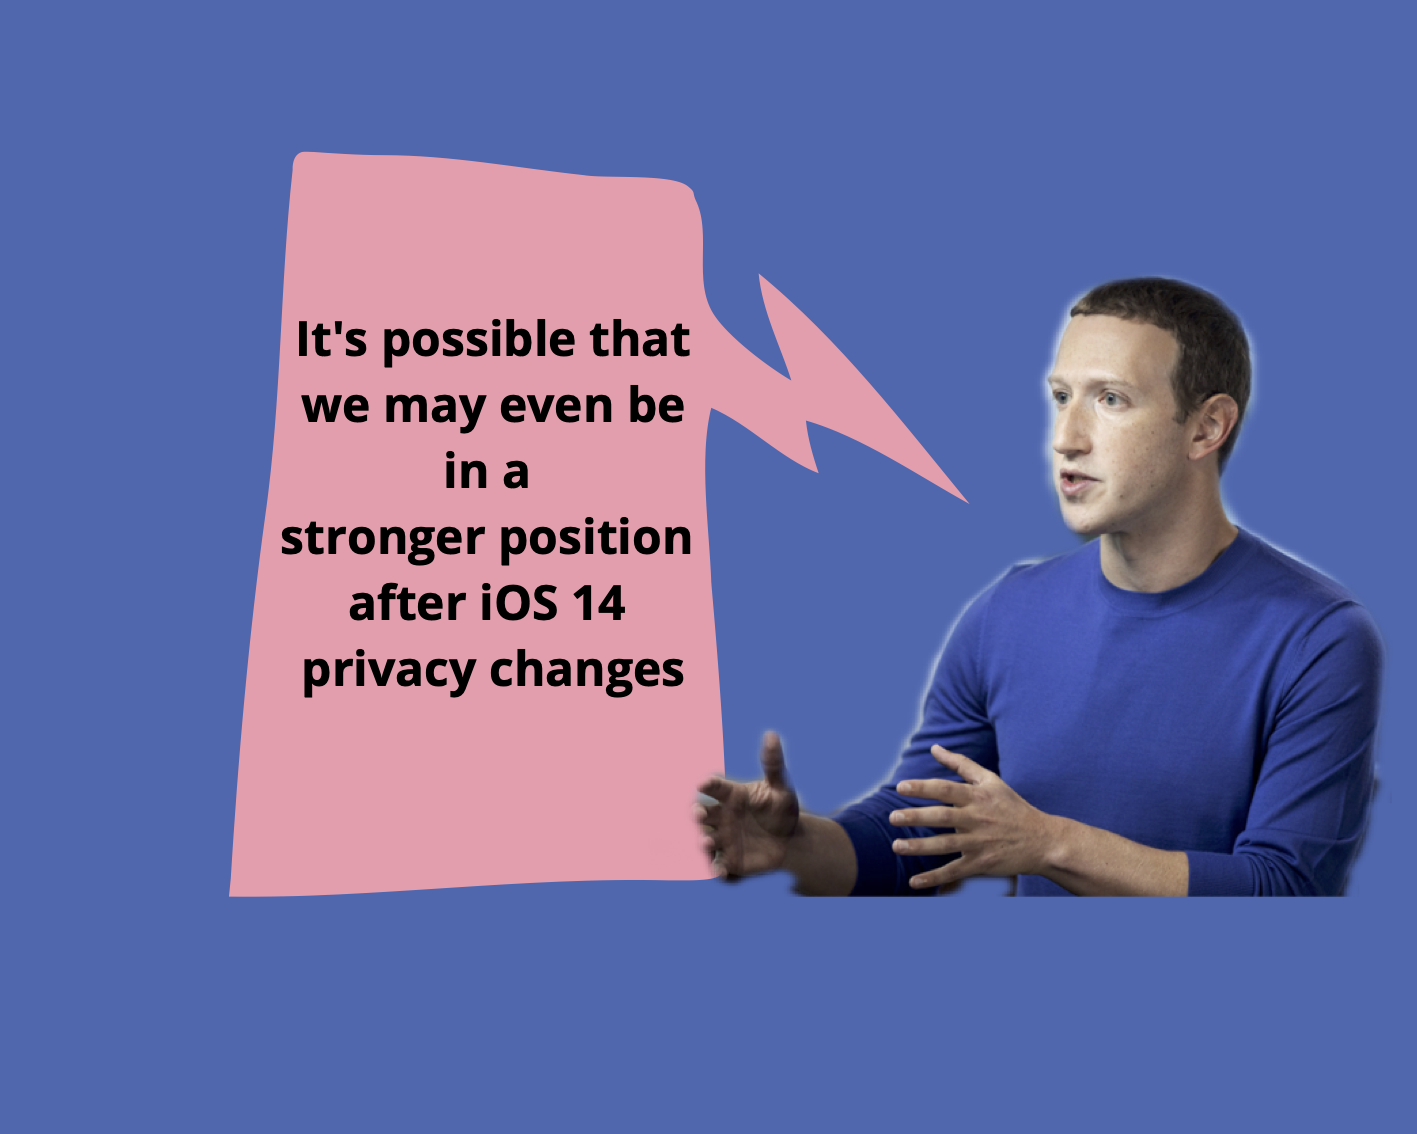 Mark Zuckerberg thinks iOS 14 might eventually benefit Facebook